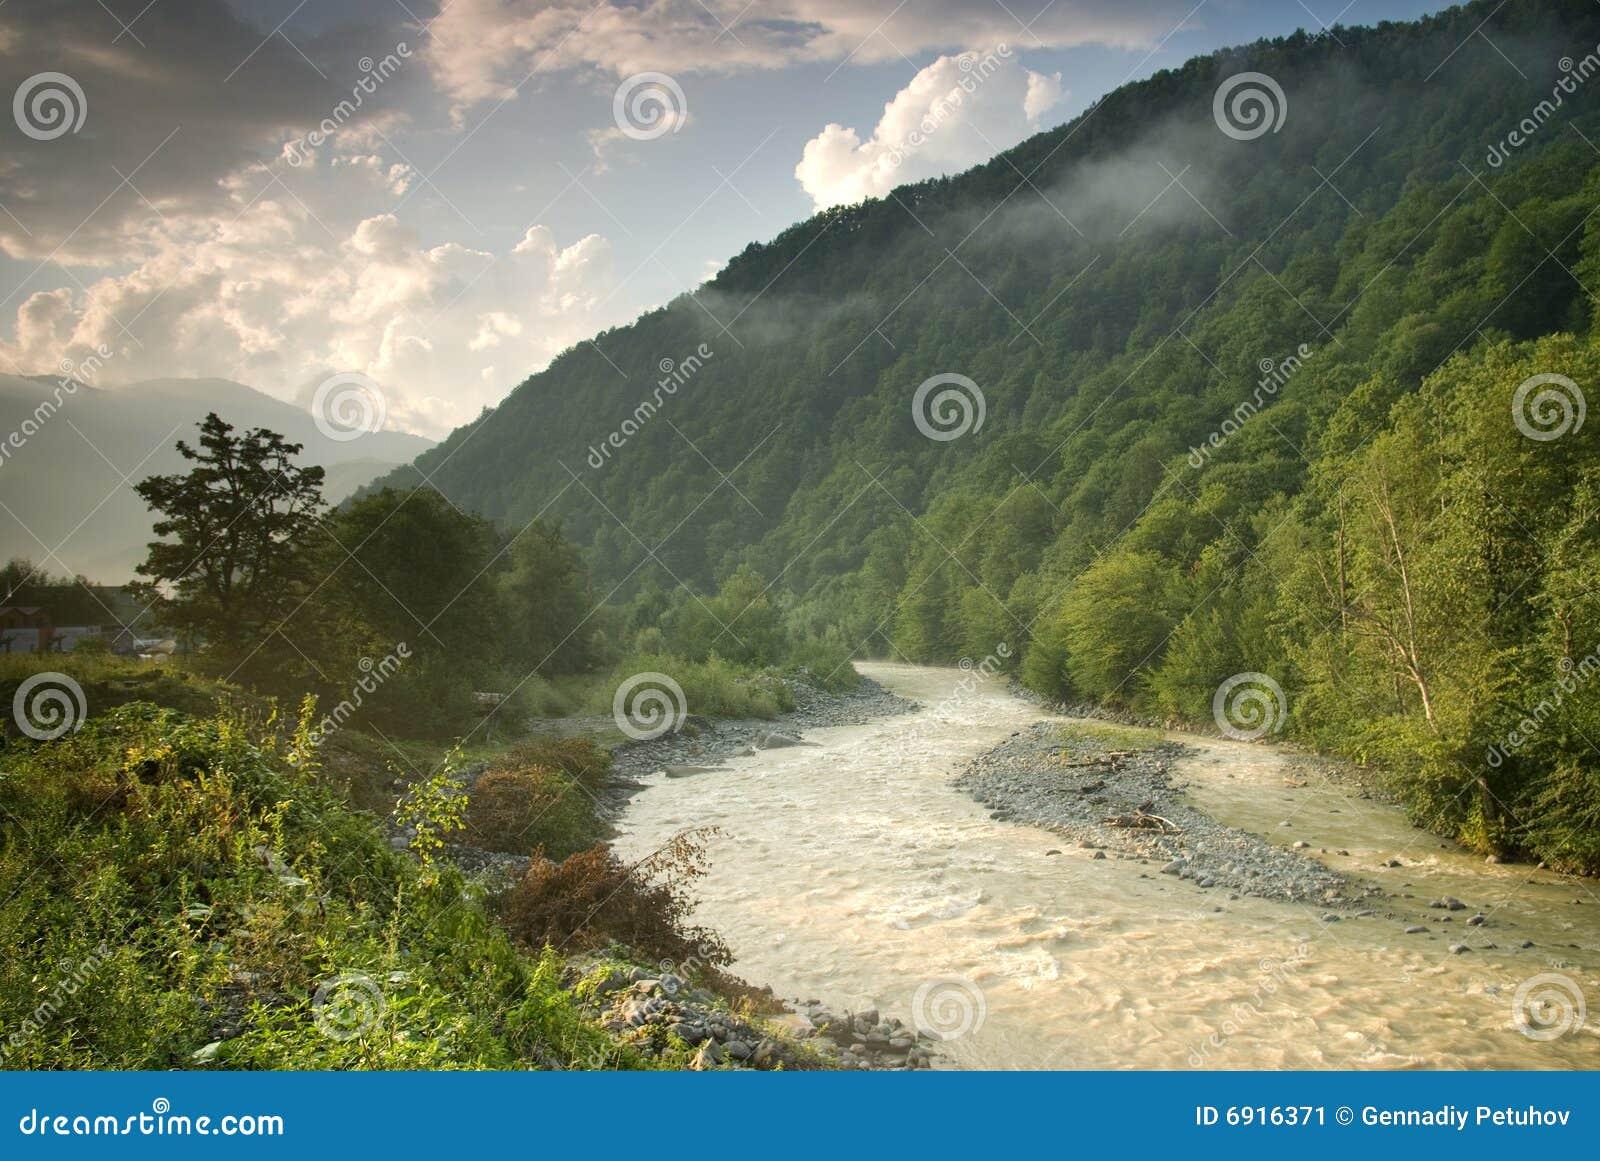 Mzymta Fluss in Krasnaya Polyana